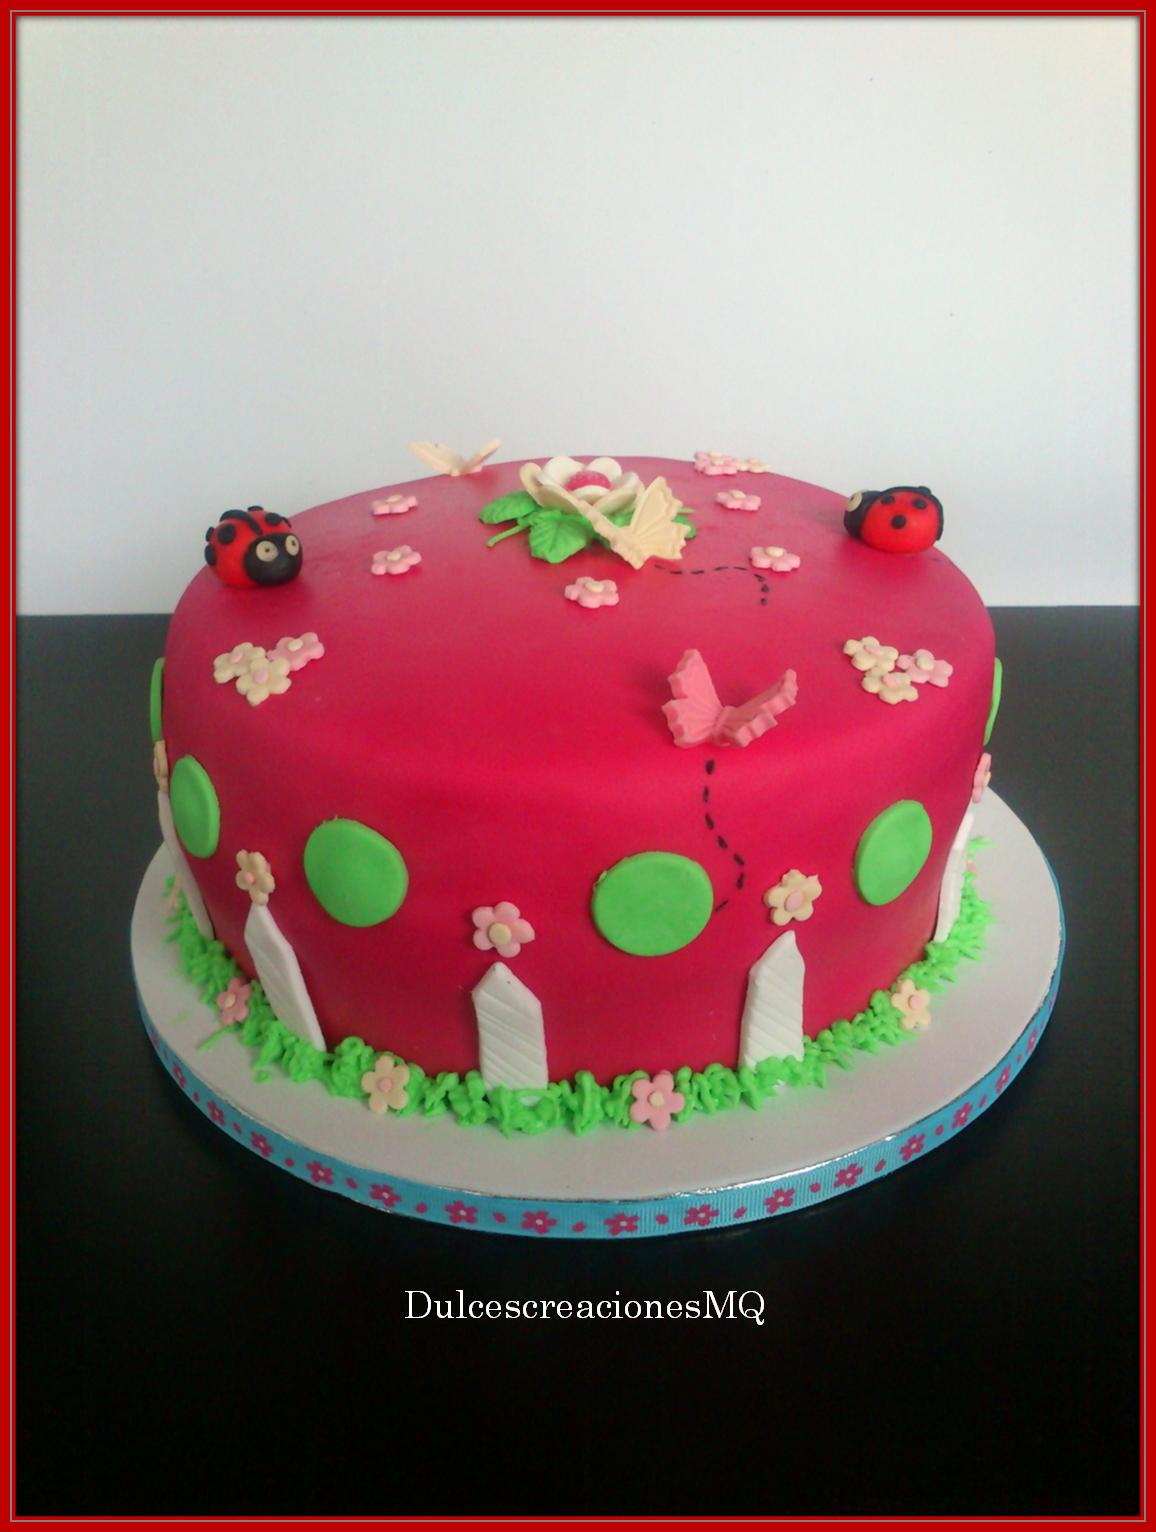 pastel fondant bizcocho madeira sponge cake cumpleaños victoria sponge cake fucsia mariquitas mariposas